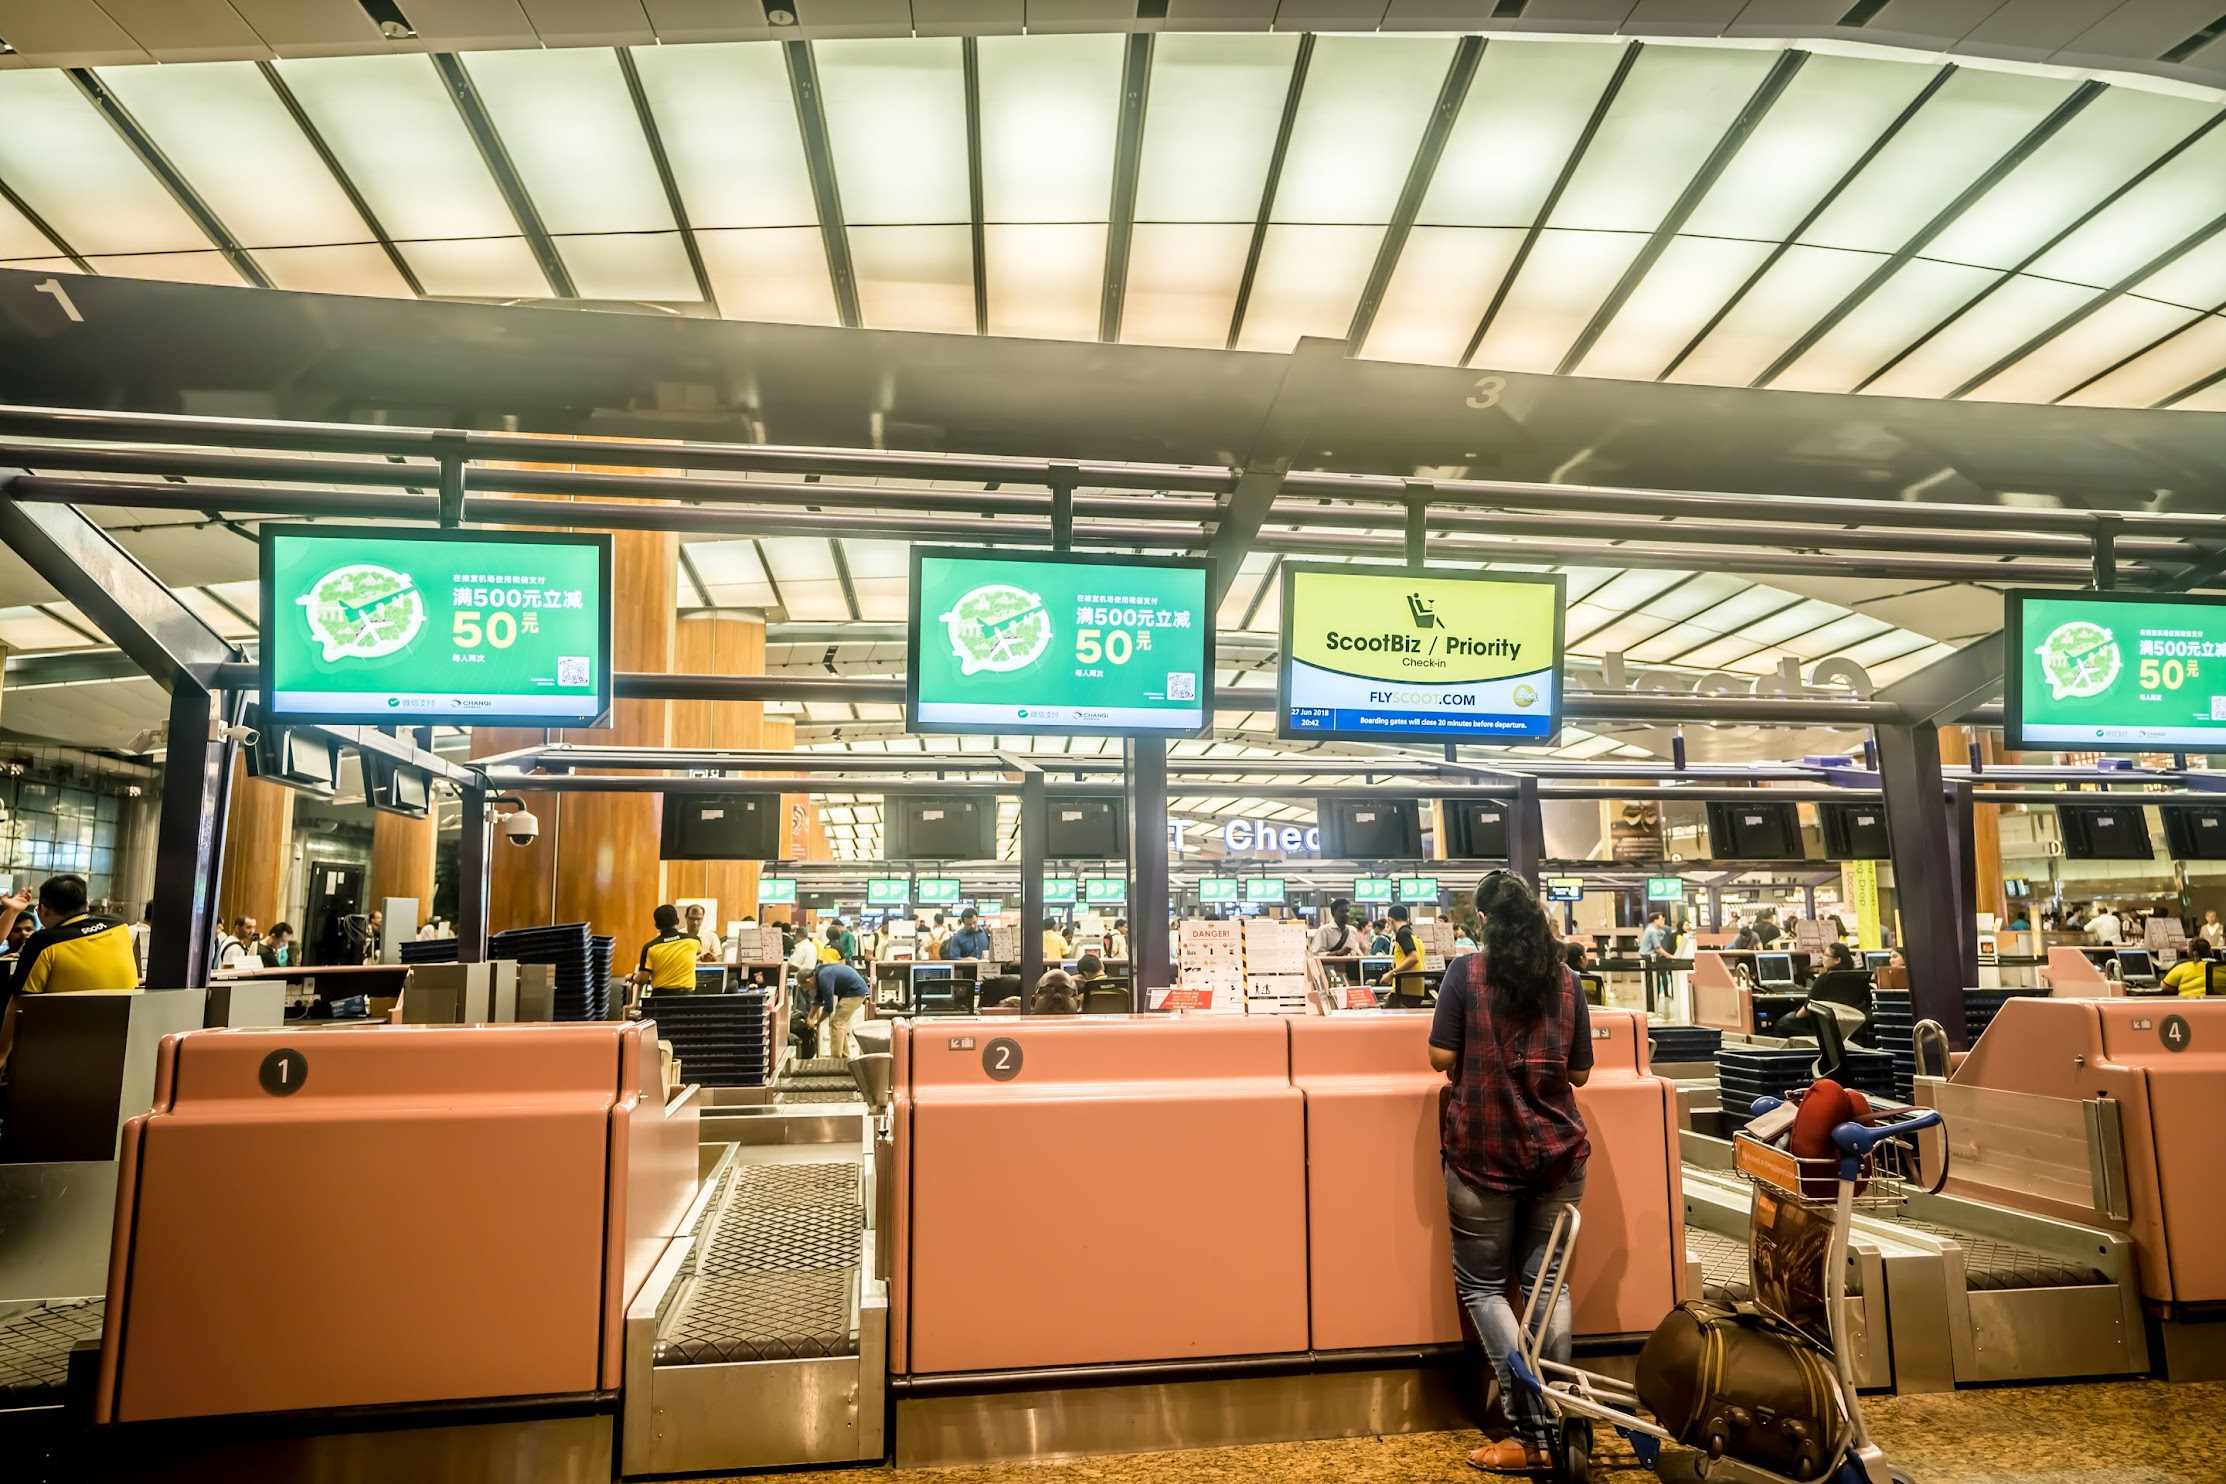 Singapore Changi Airport Scoot